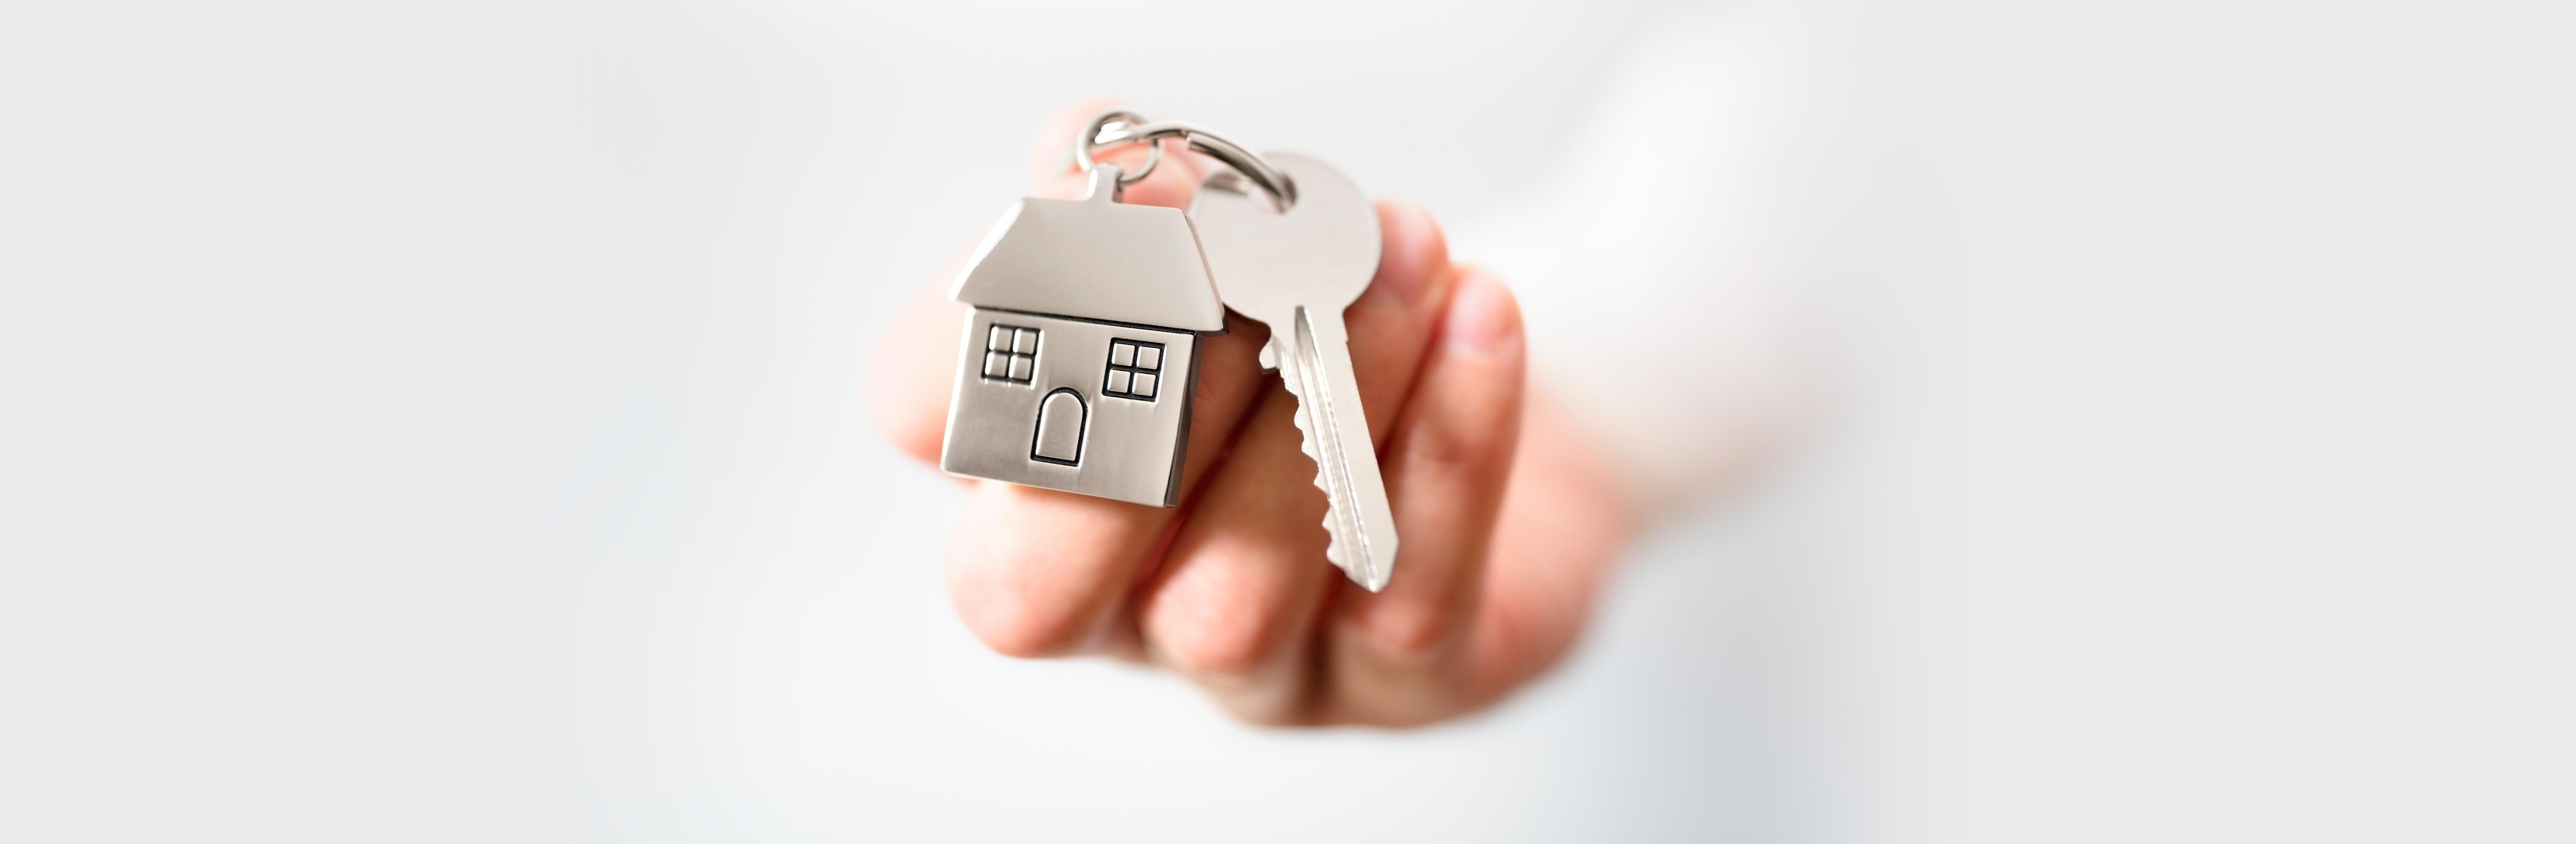 O que saber antes de vender casa?